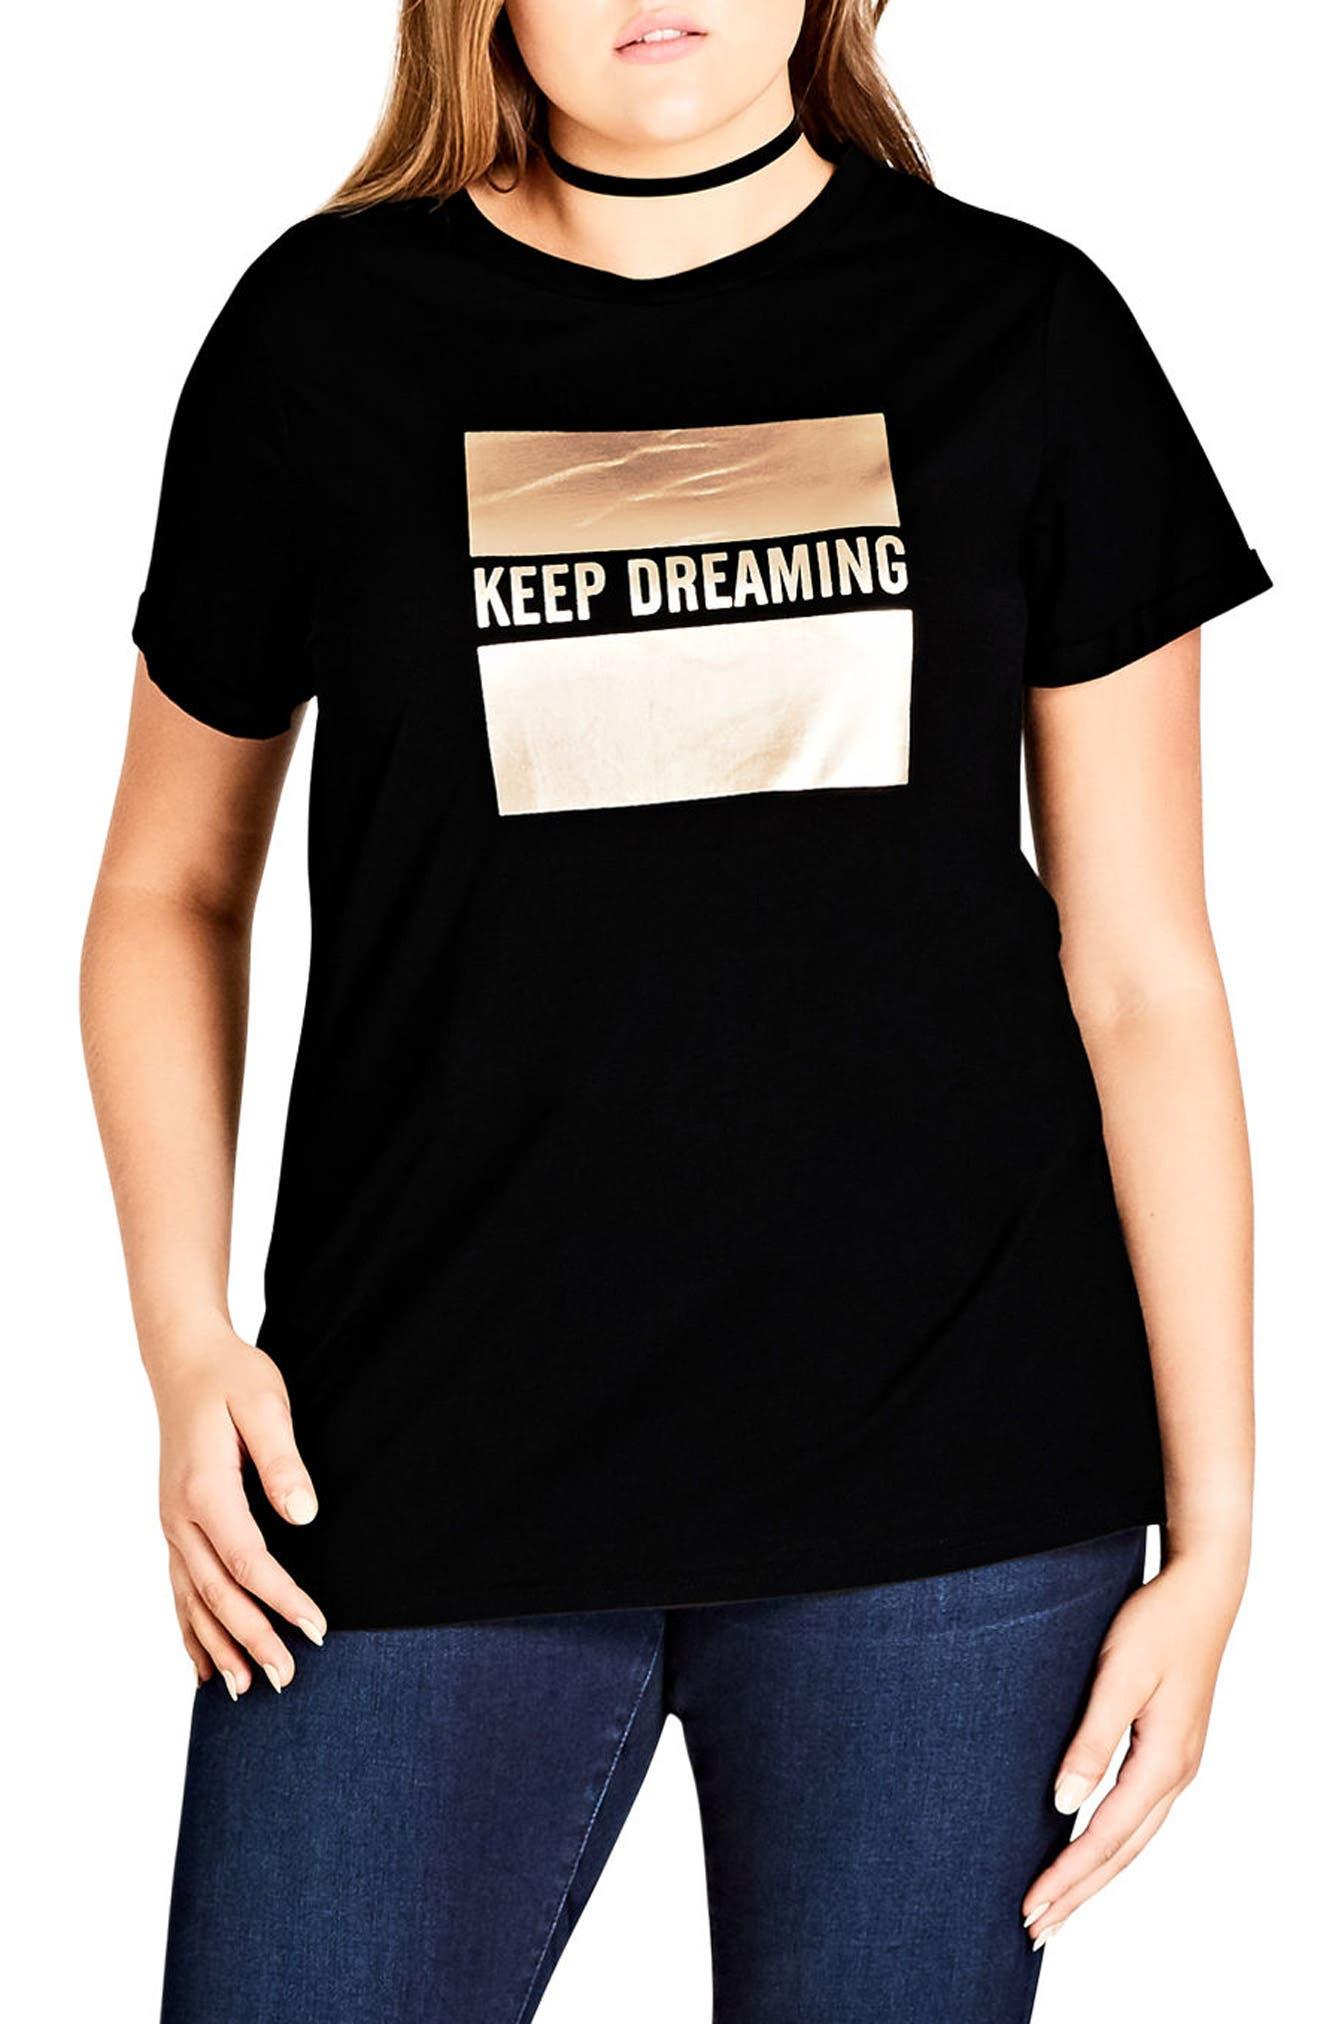 Dreaming Graphic Tee,                             Main thumbnail 1, color,                             Black